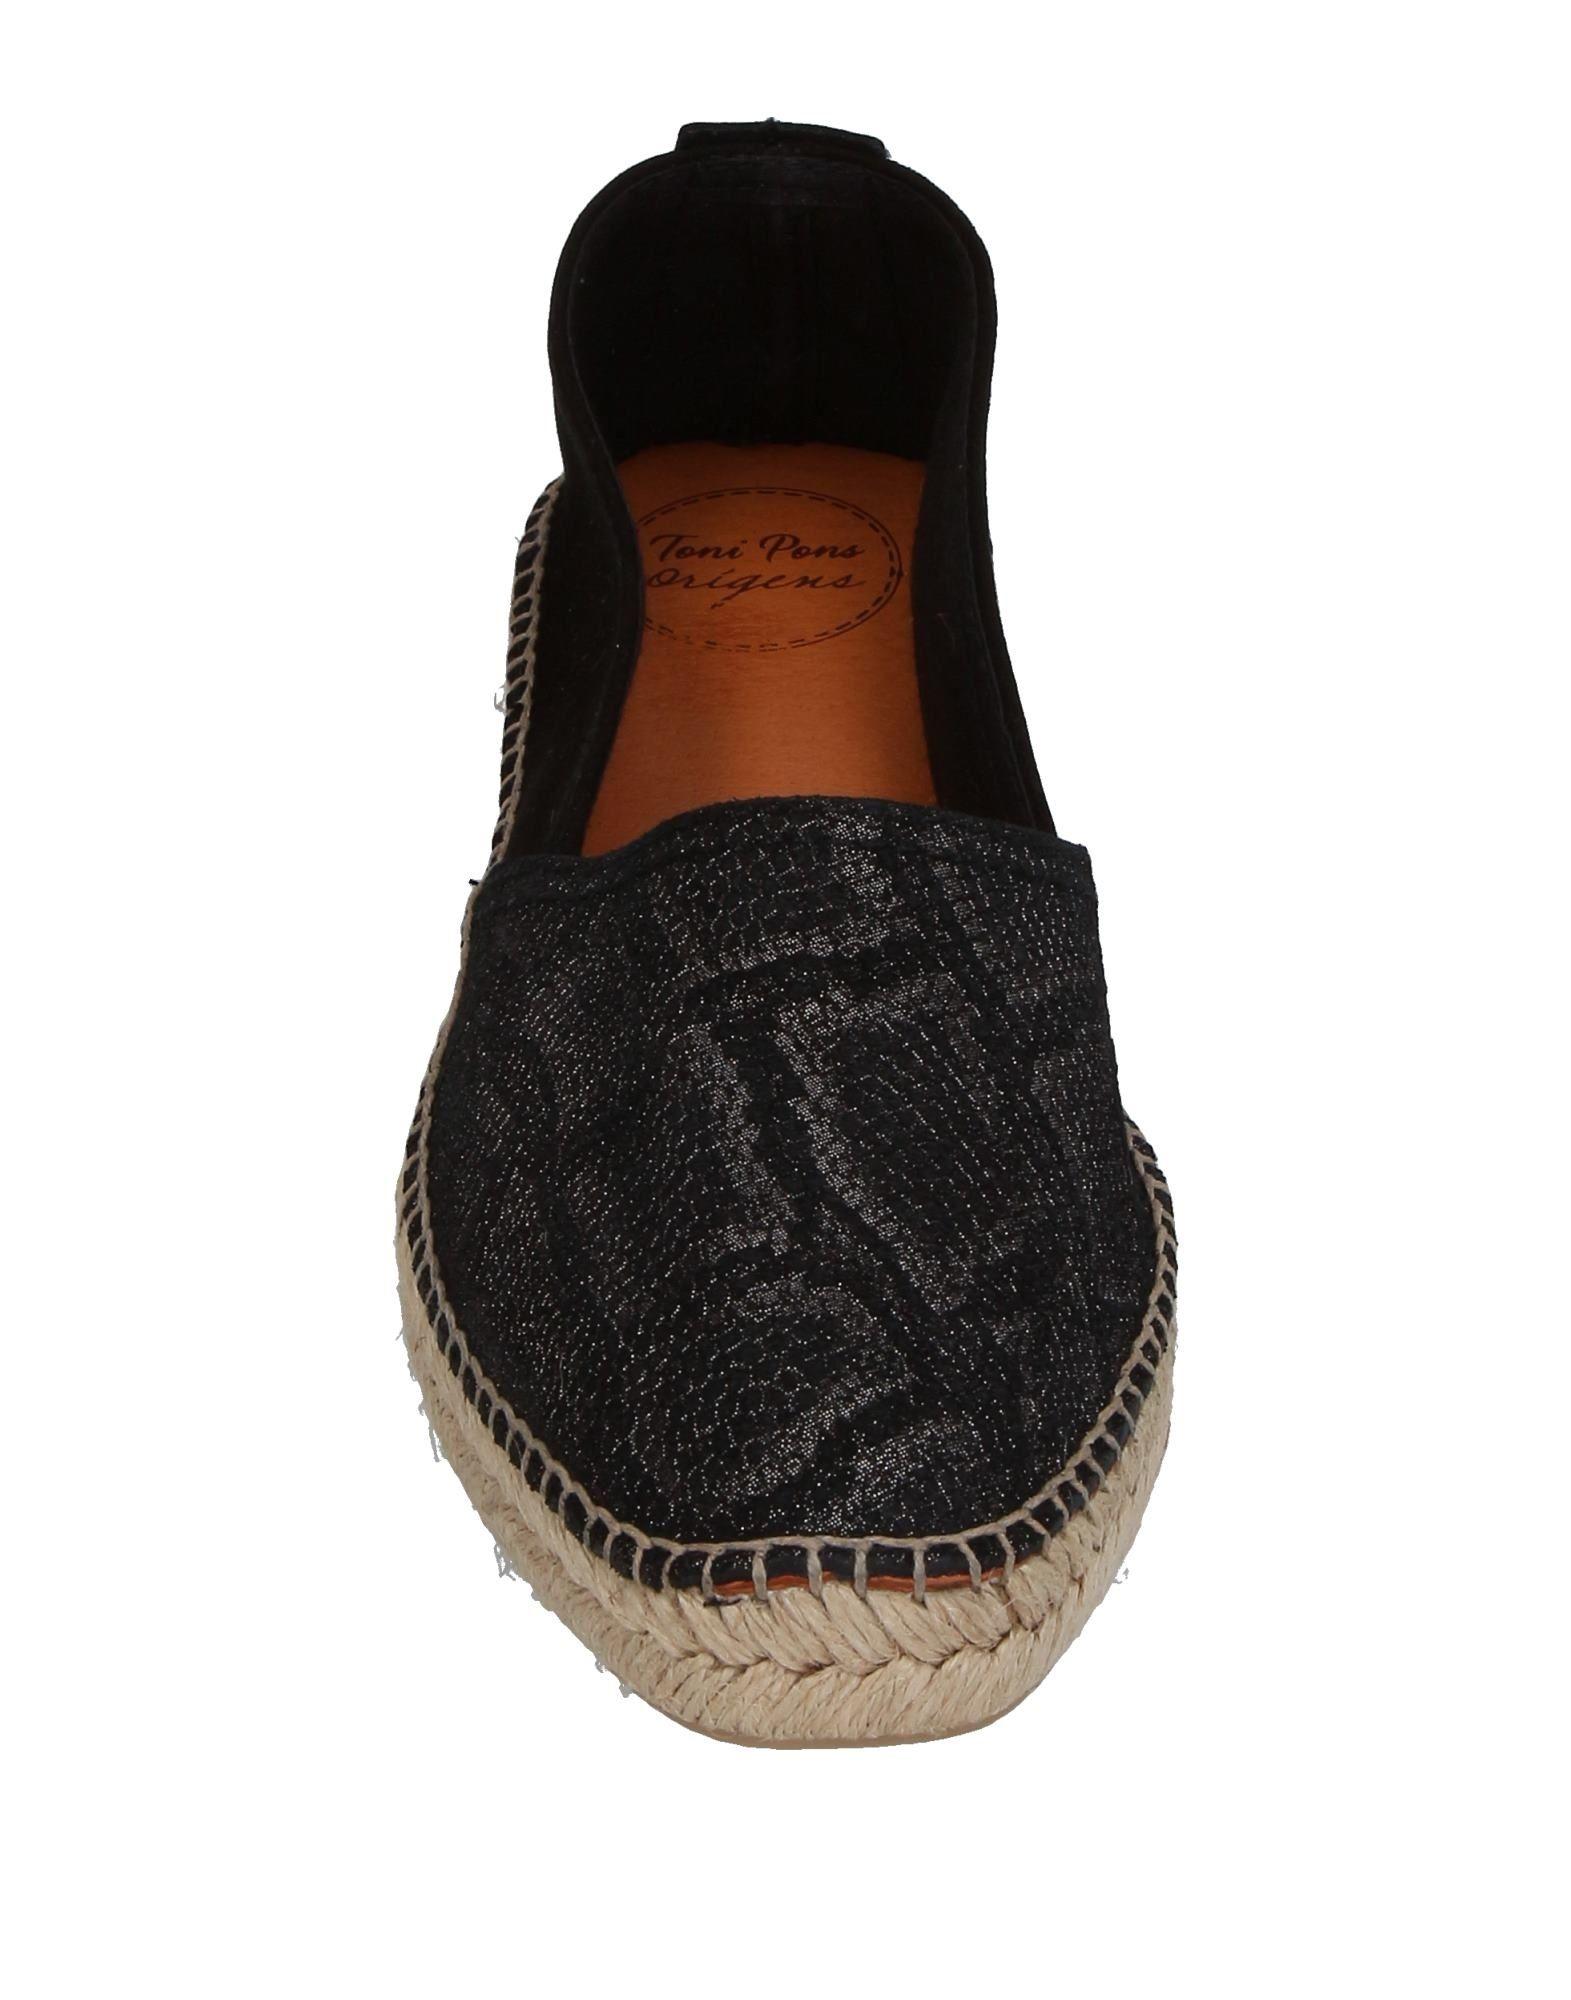 Toni Pons Espadrilles Damen  11376285WI 11376285WI 11376285WI Neue Schuhe c0ed61